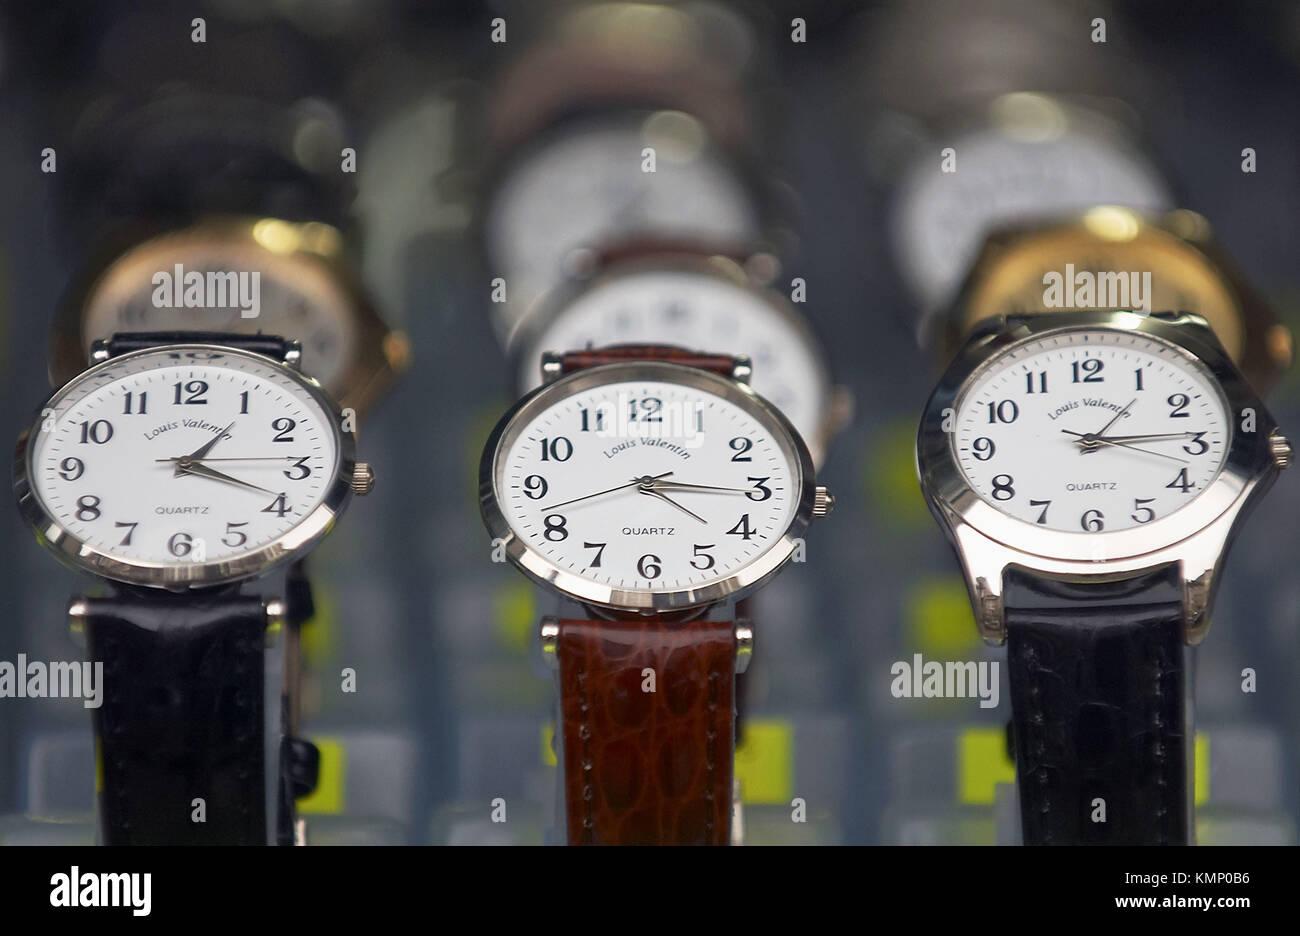 Portugal Watches Imágenes De Stock   Portugal Watches Fotos De Stock ... 4c0e243cff4